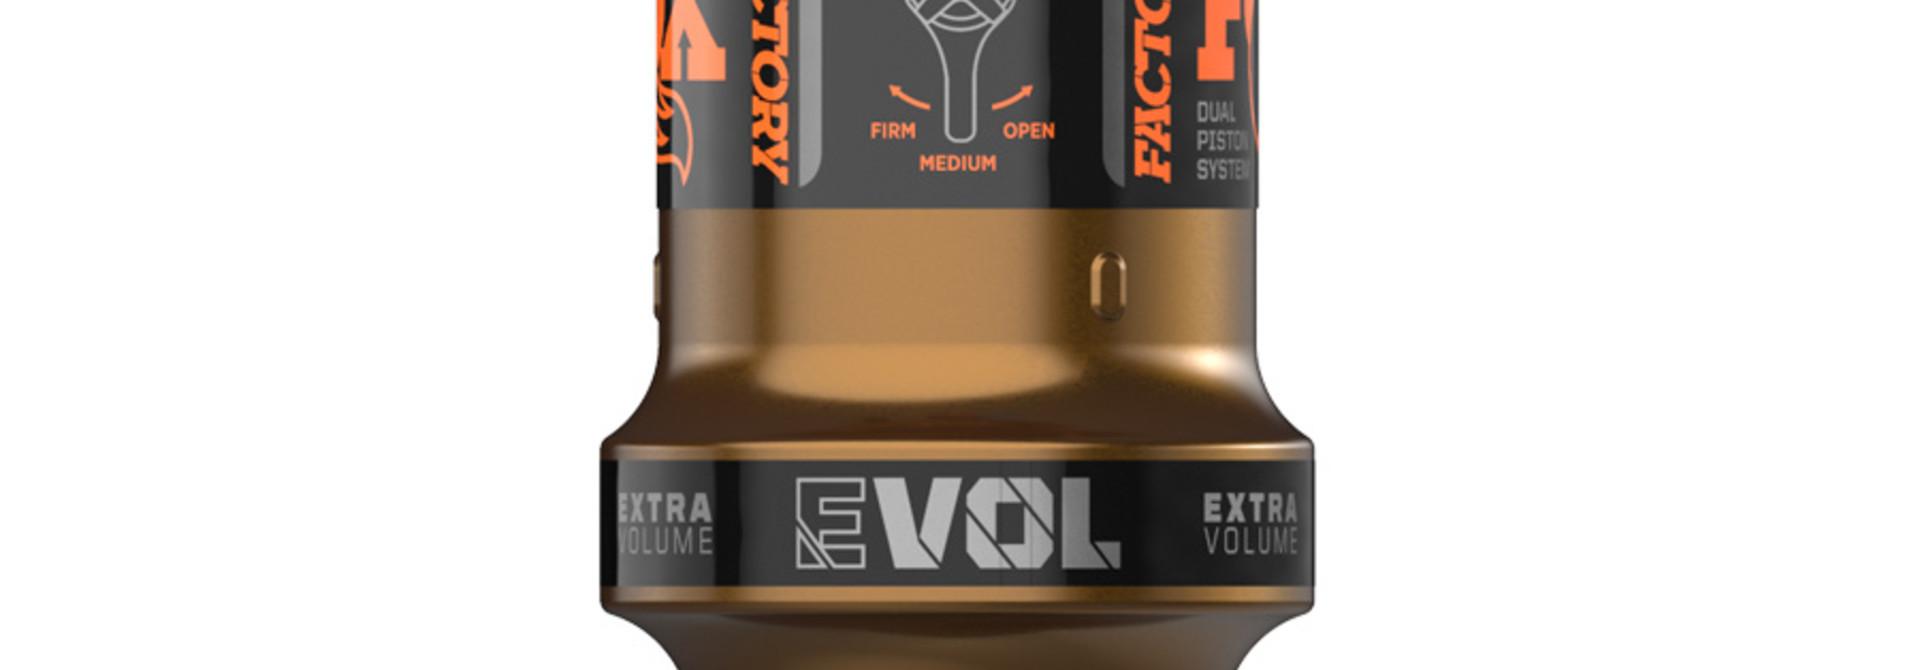 2021 Fox Float Factory DPS, 3pos-Adj, Evol LV, 7.5x2.0